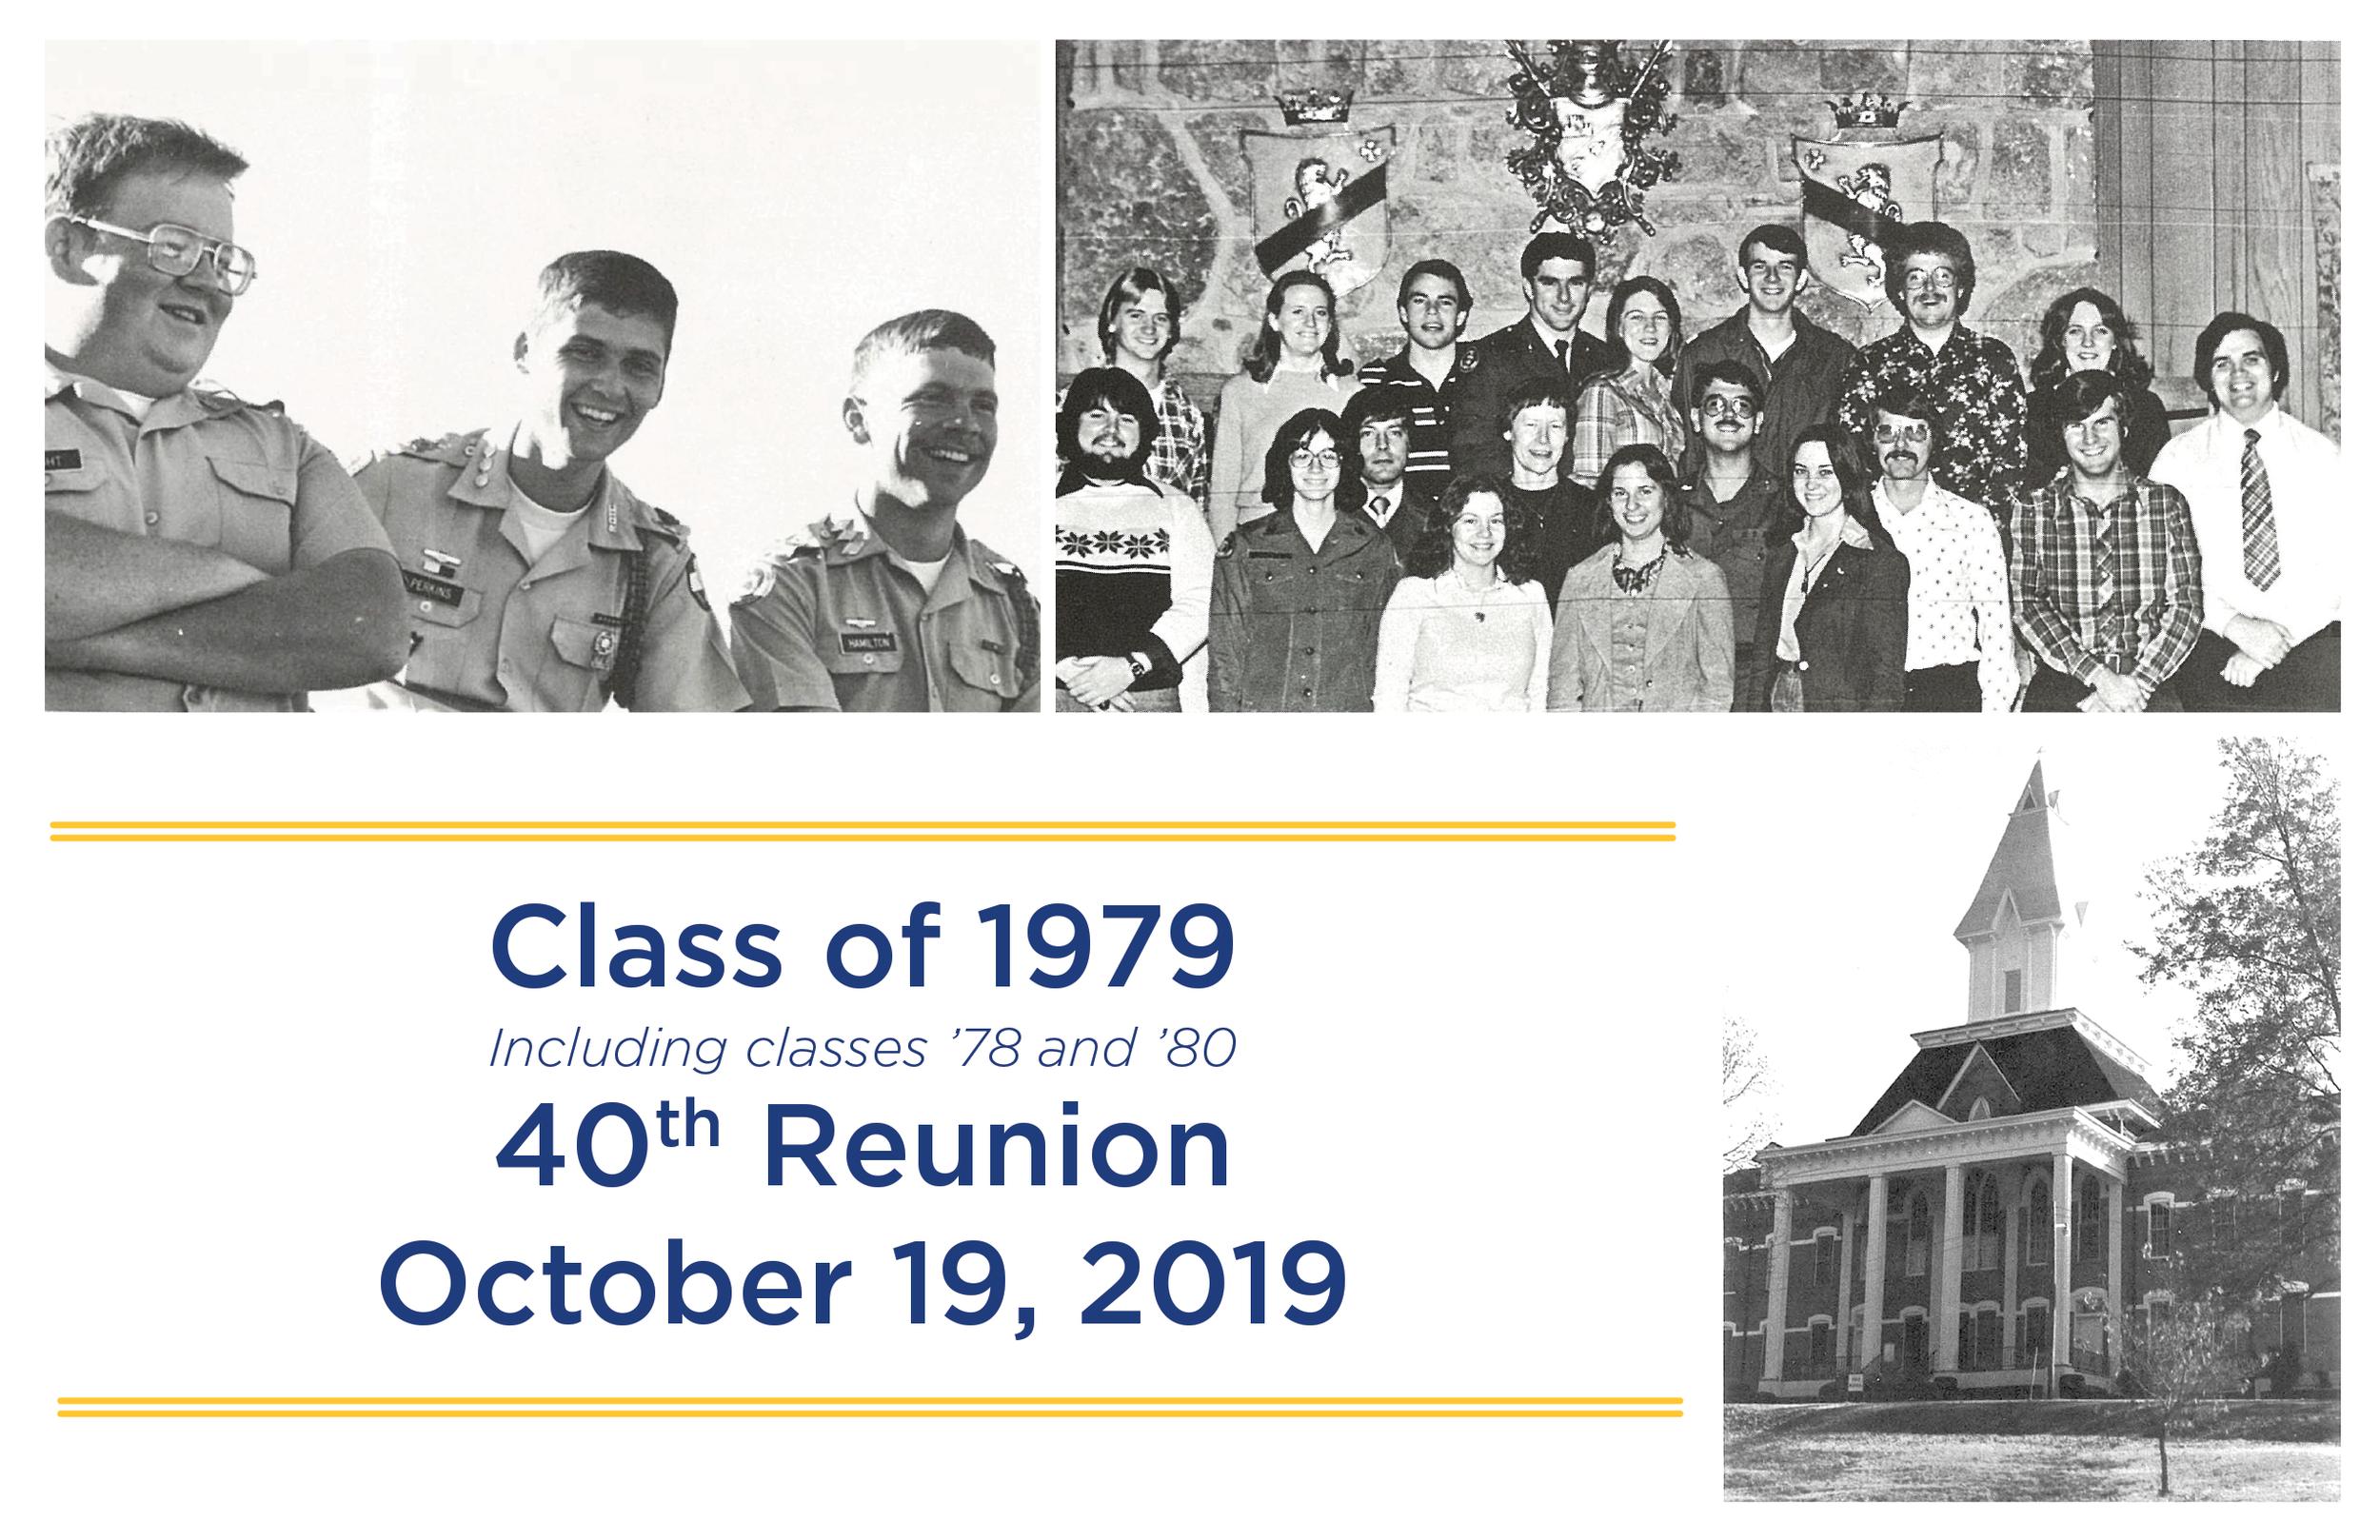 Class-of-1979-Reunion-Card4.png